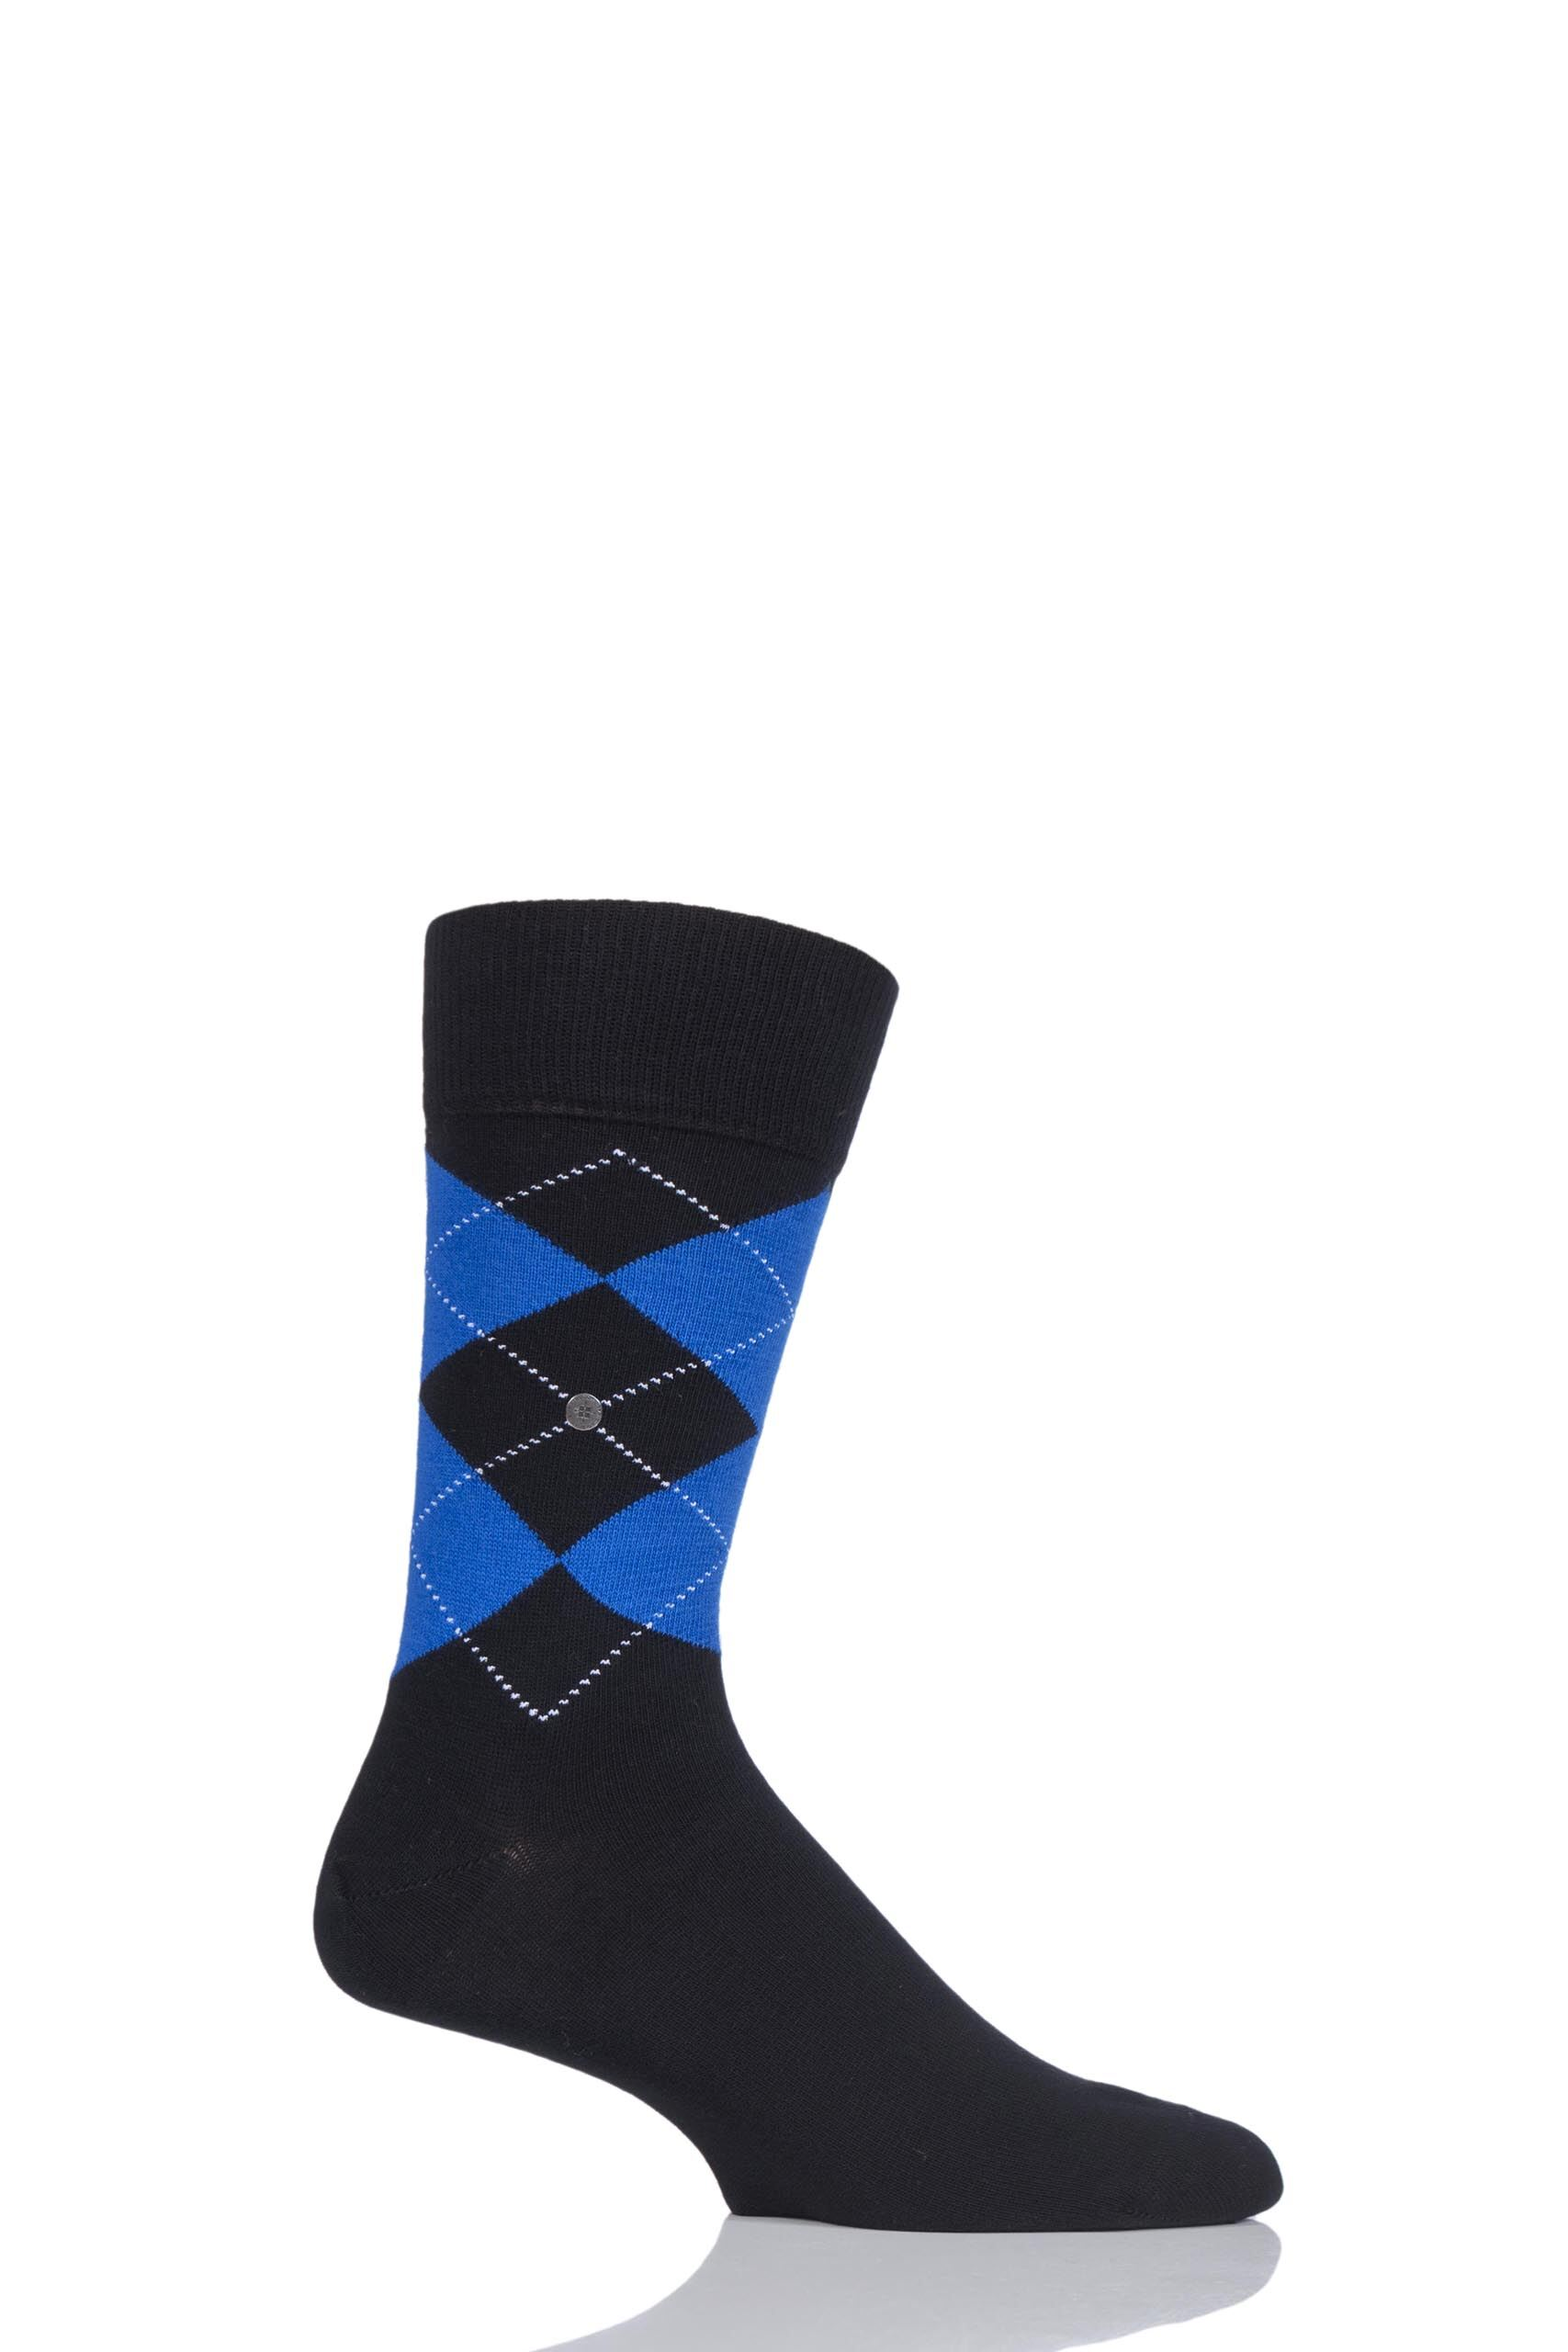 Image of 1 Pair Black / Blue King Argyle Cotton Socks Men's 6.5-11 Mens - Burlington